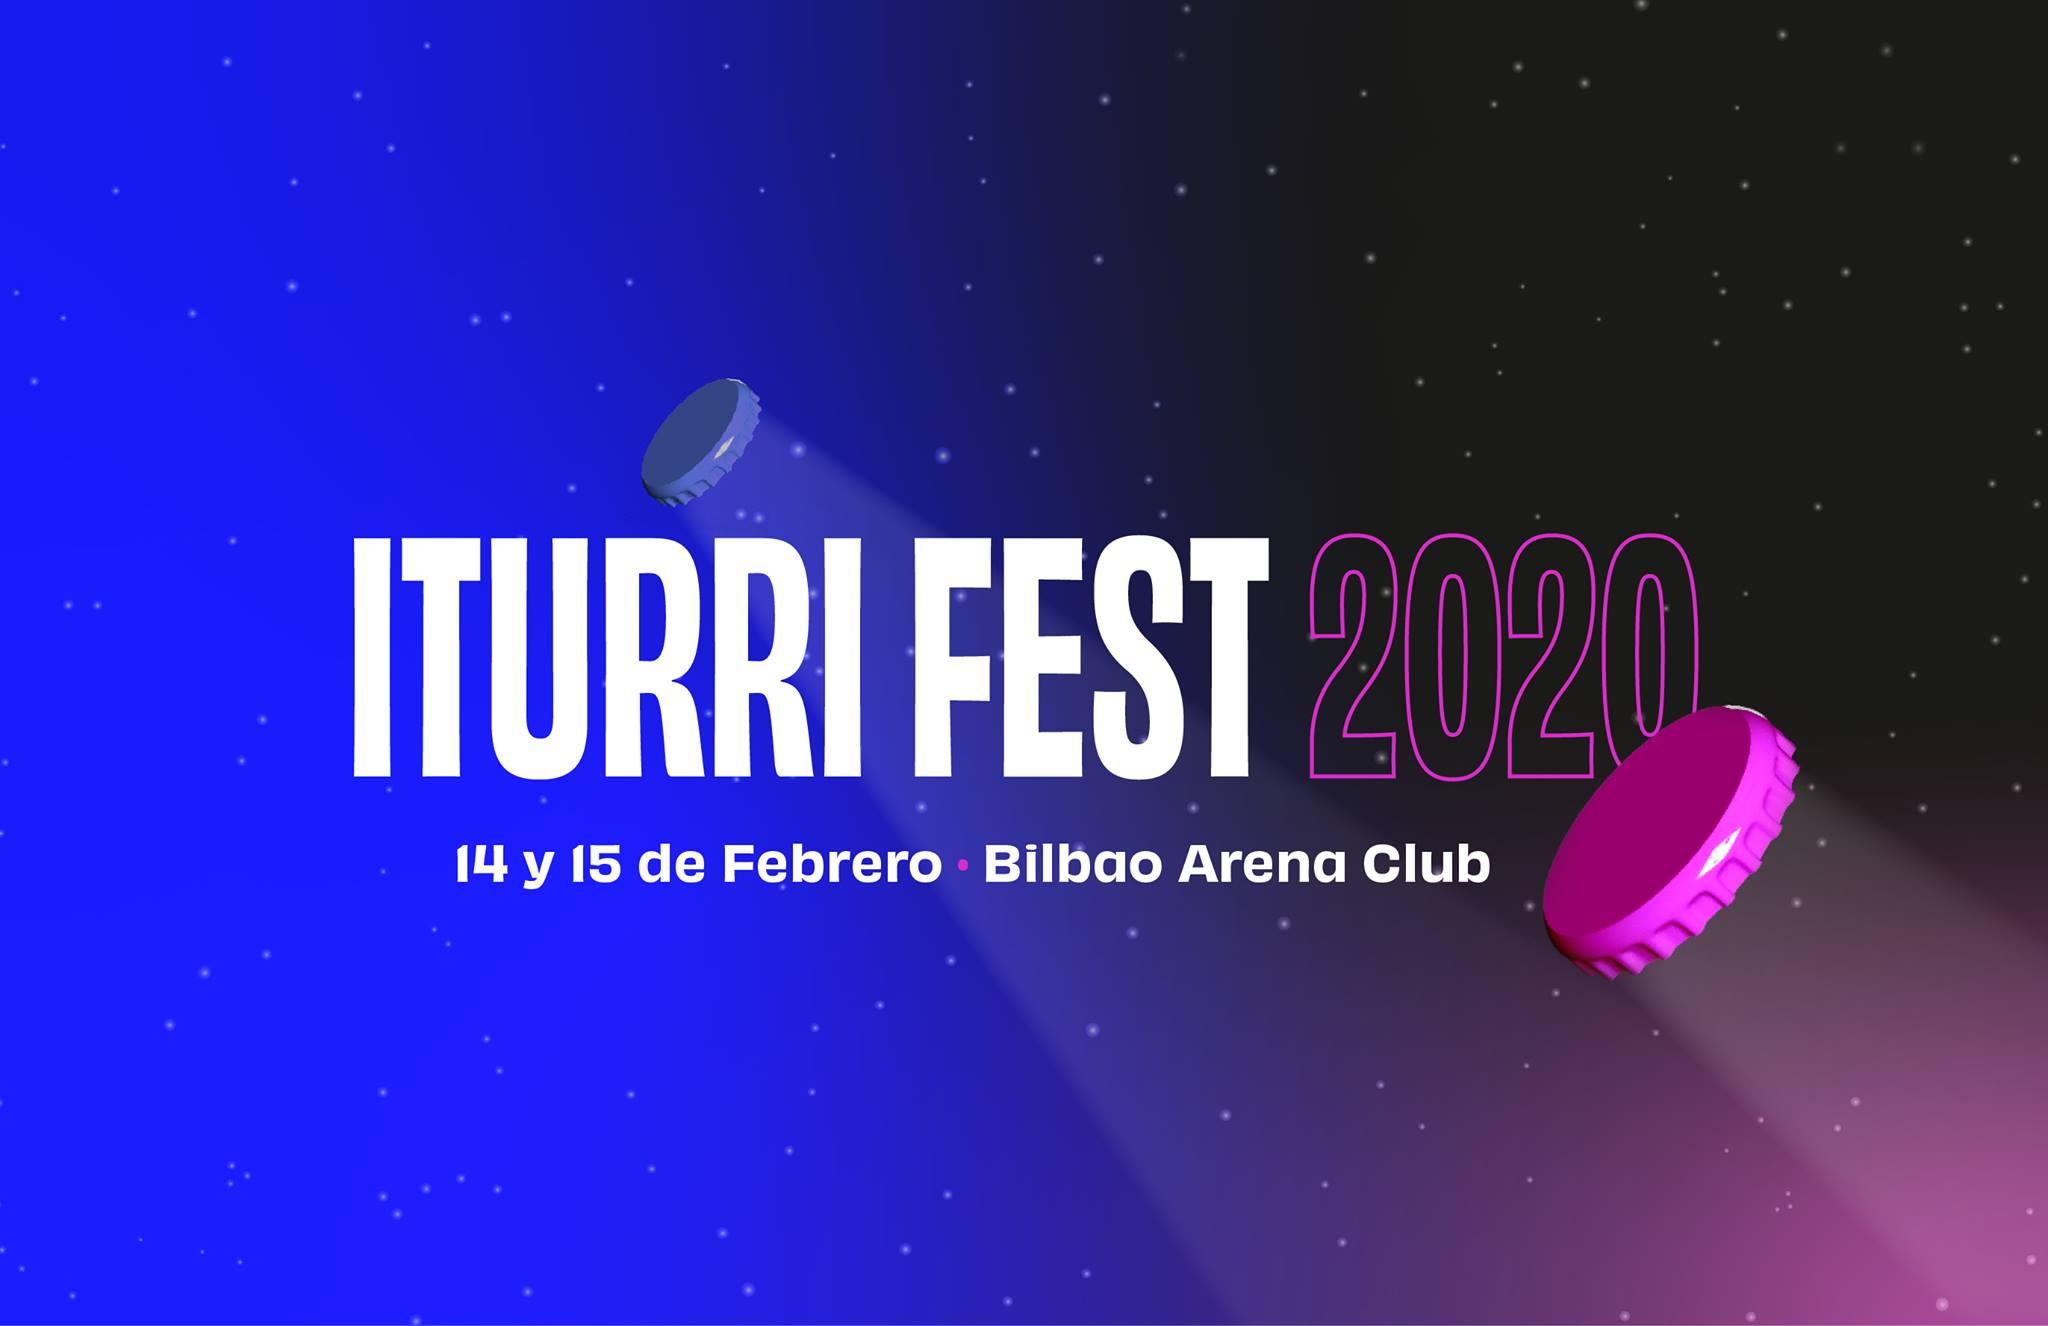 Festival Cerveza Artesana Iturrifest 2020 Bilbao